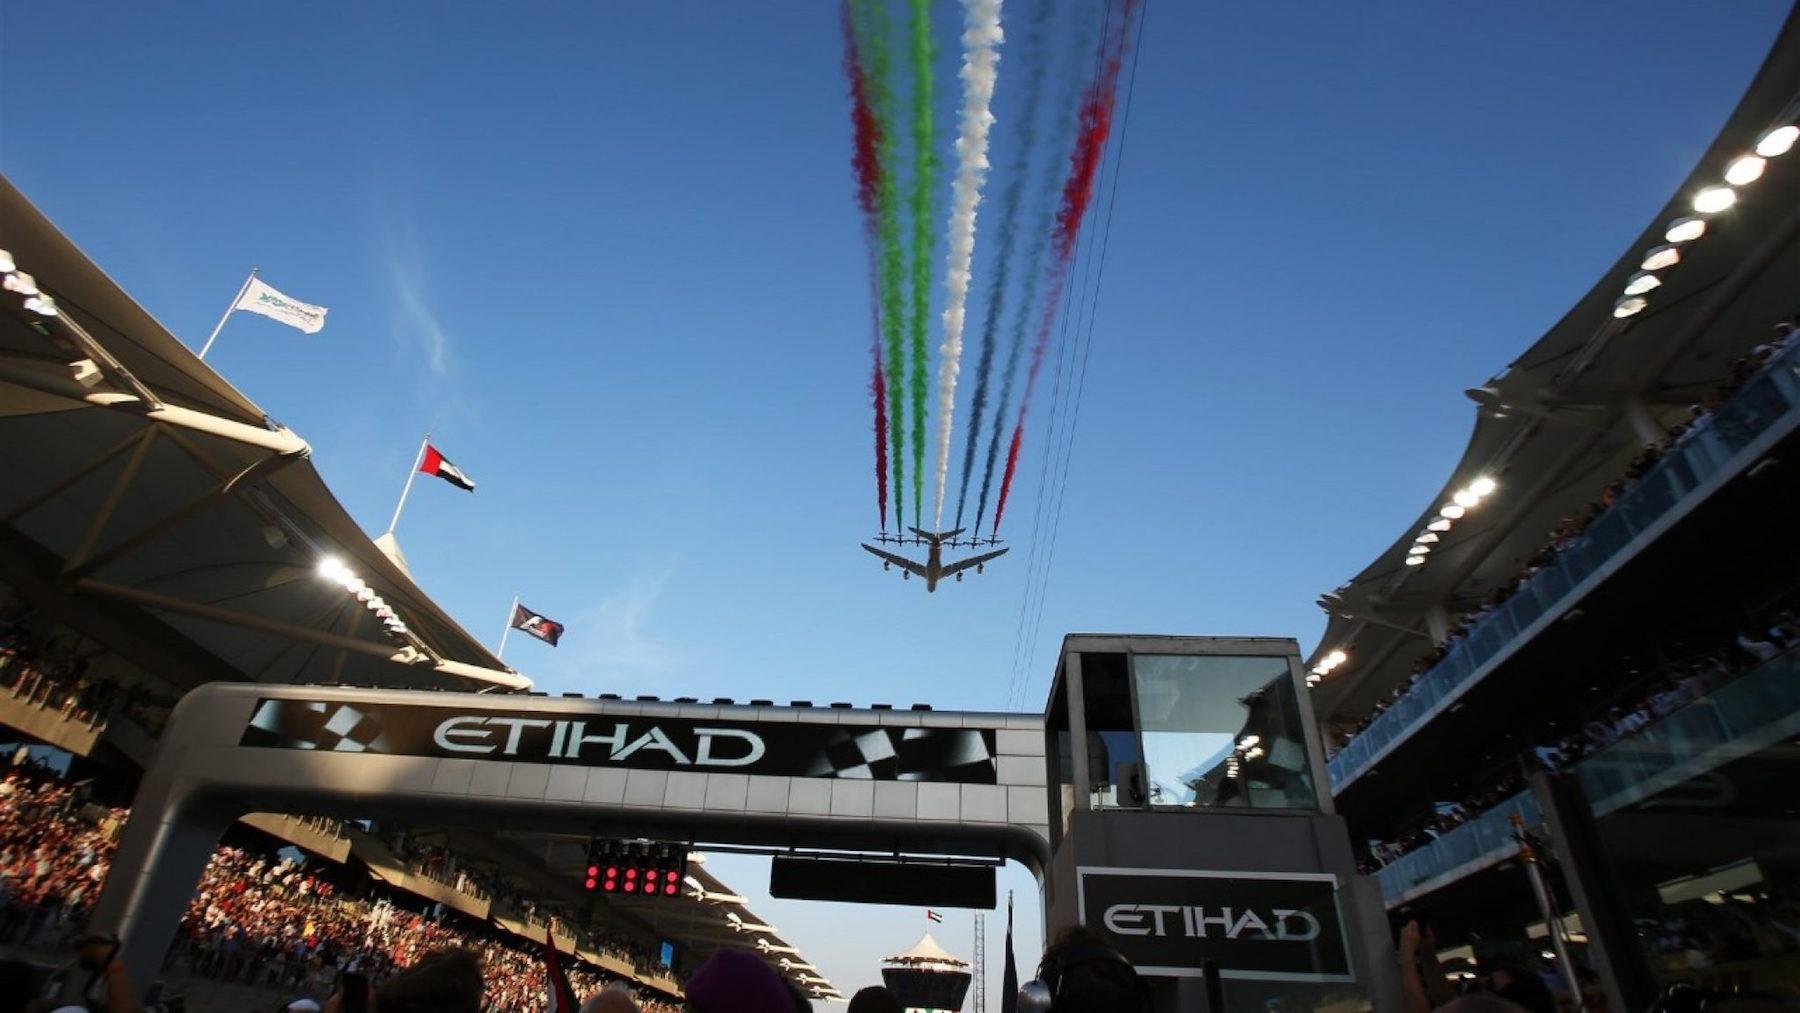 Salracing | Pre-race ceremonies at Baku